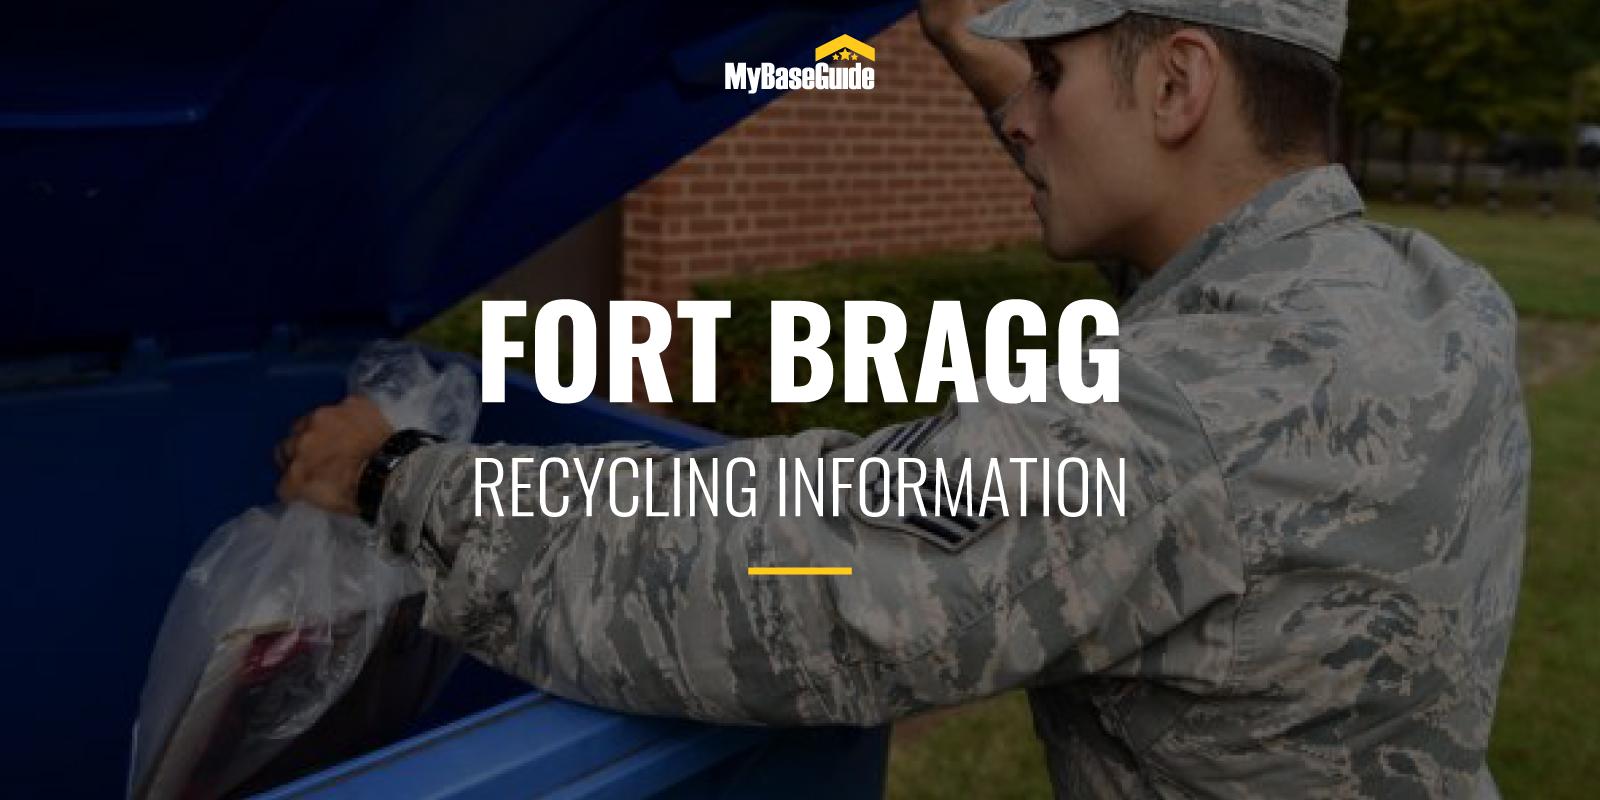 Fort Bragg Recycling